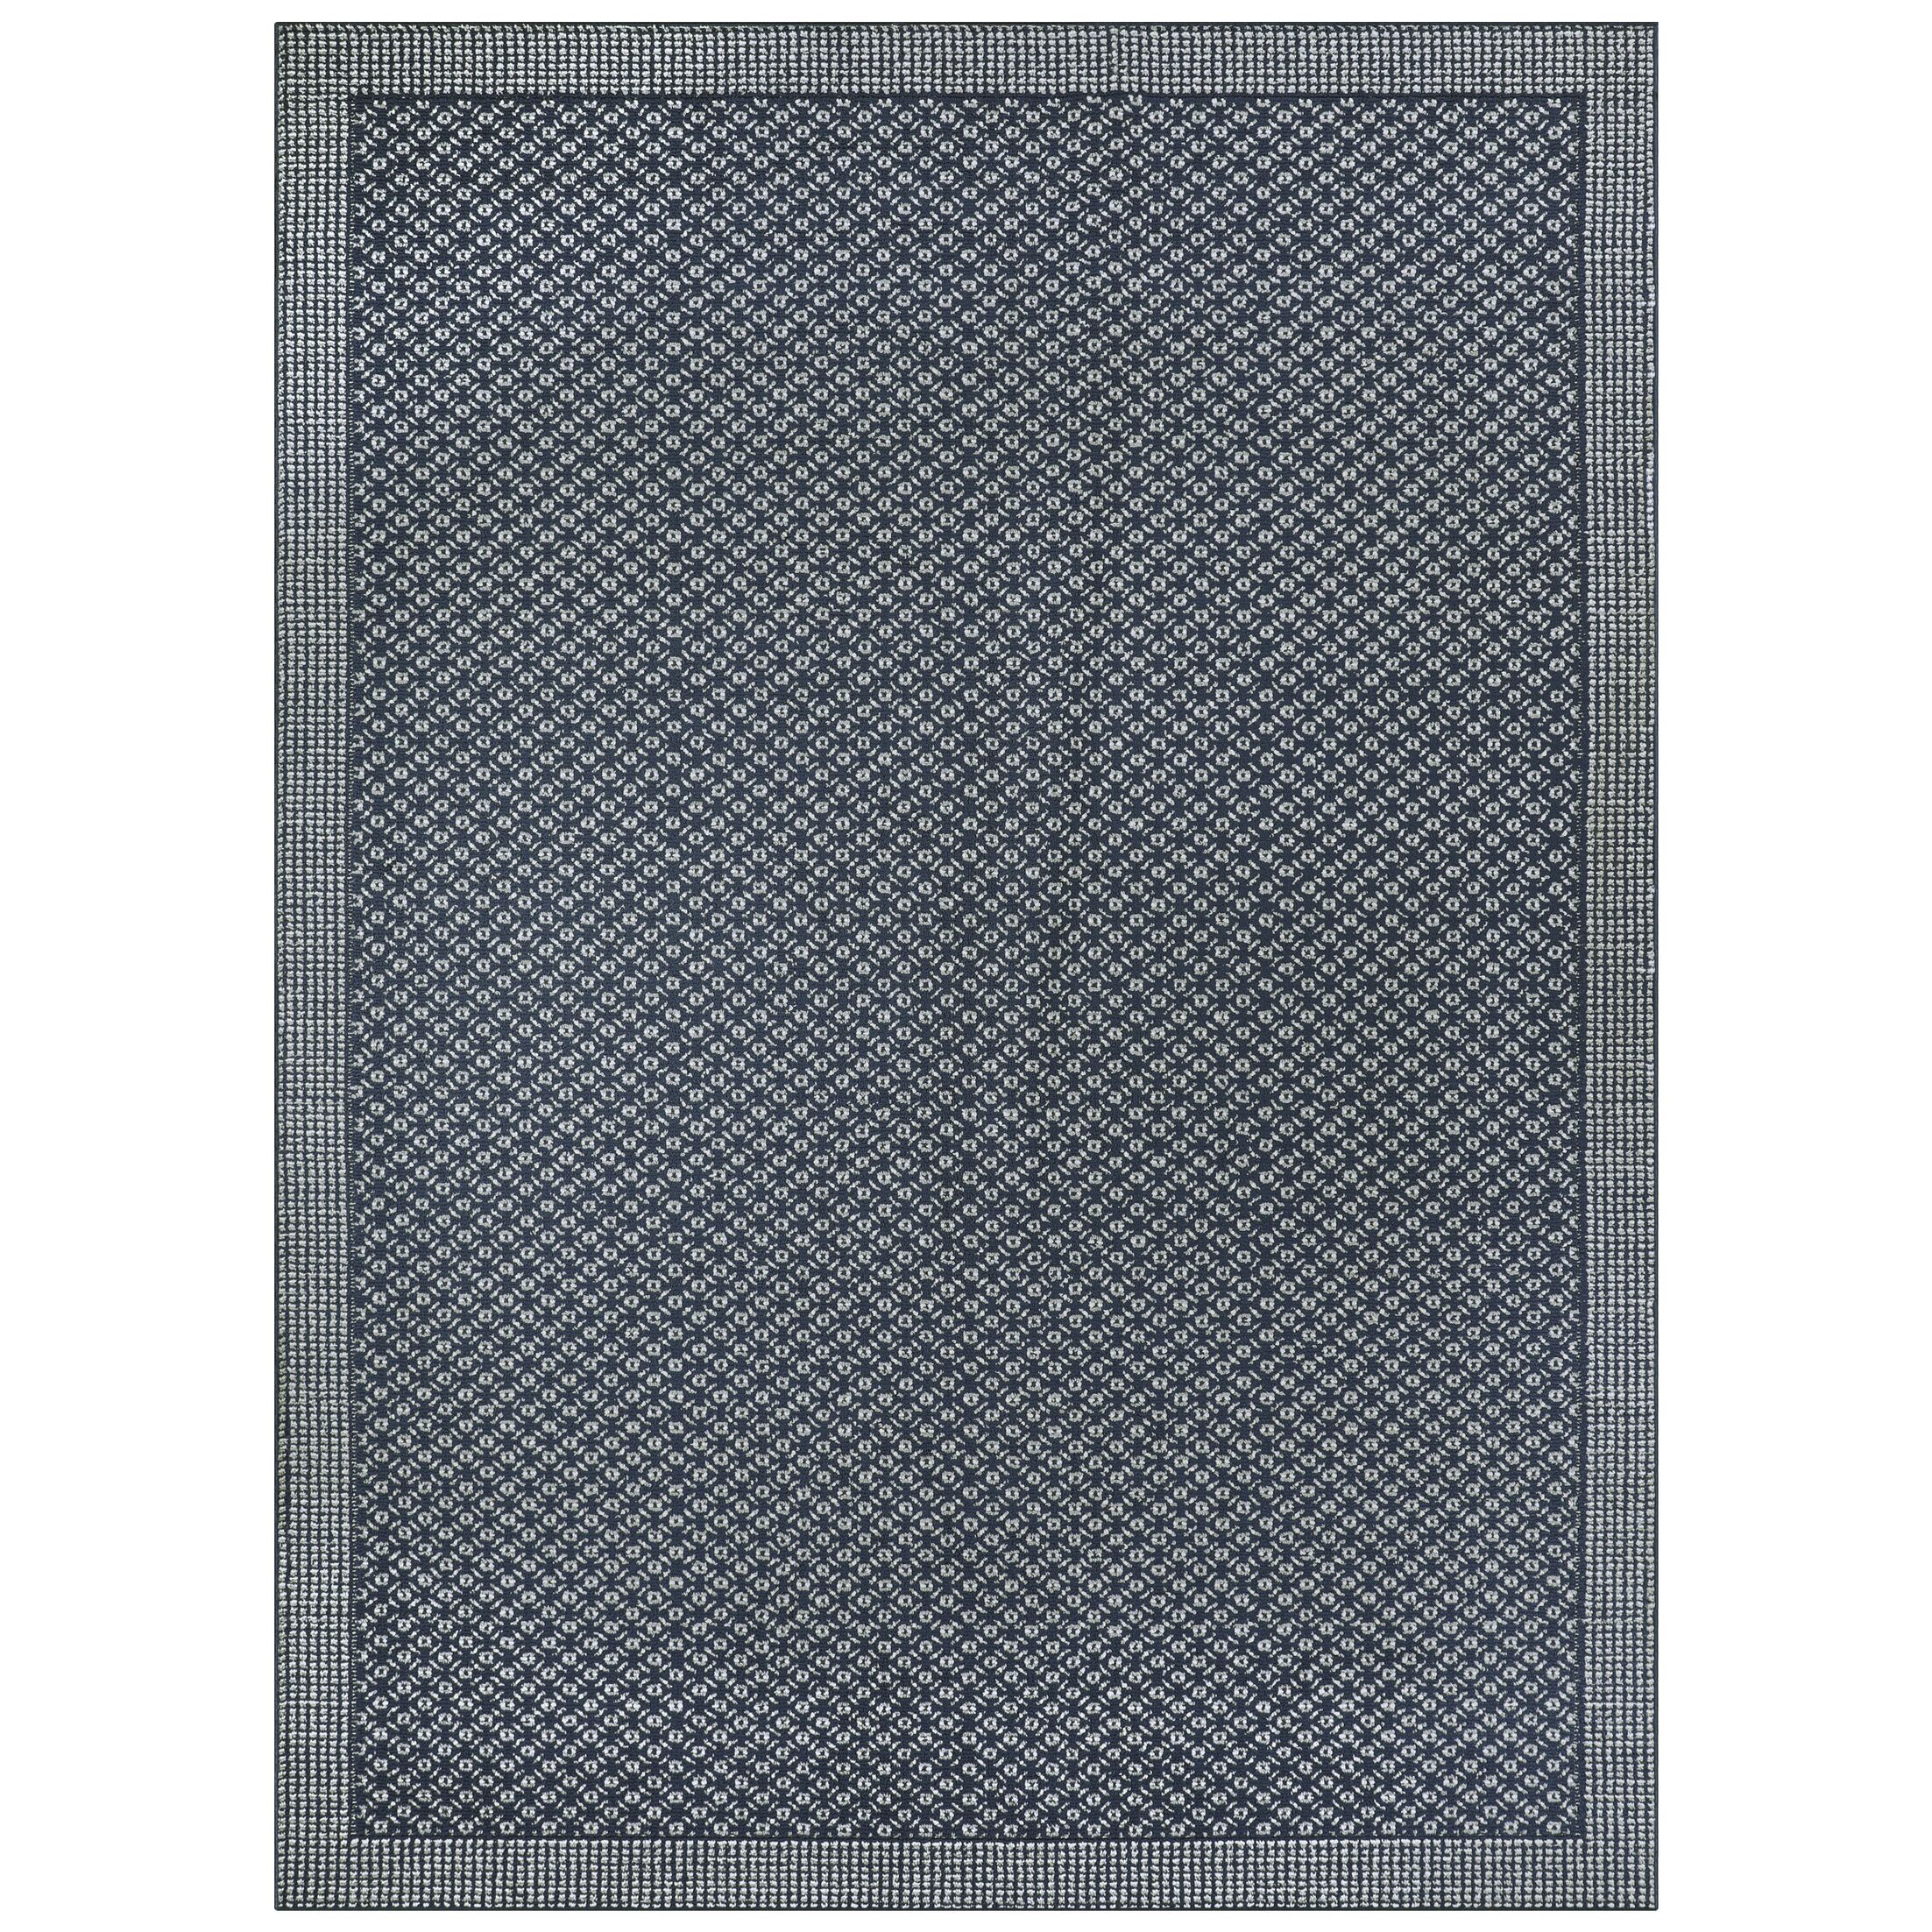 Ohlone Navy Area Rug Rug Size: Rectangle 7' x 10'